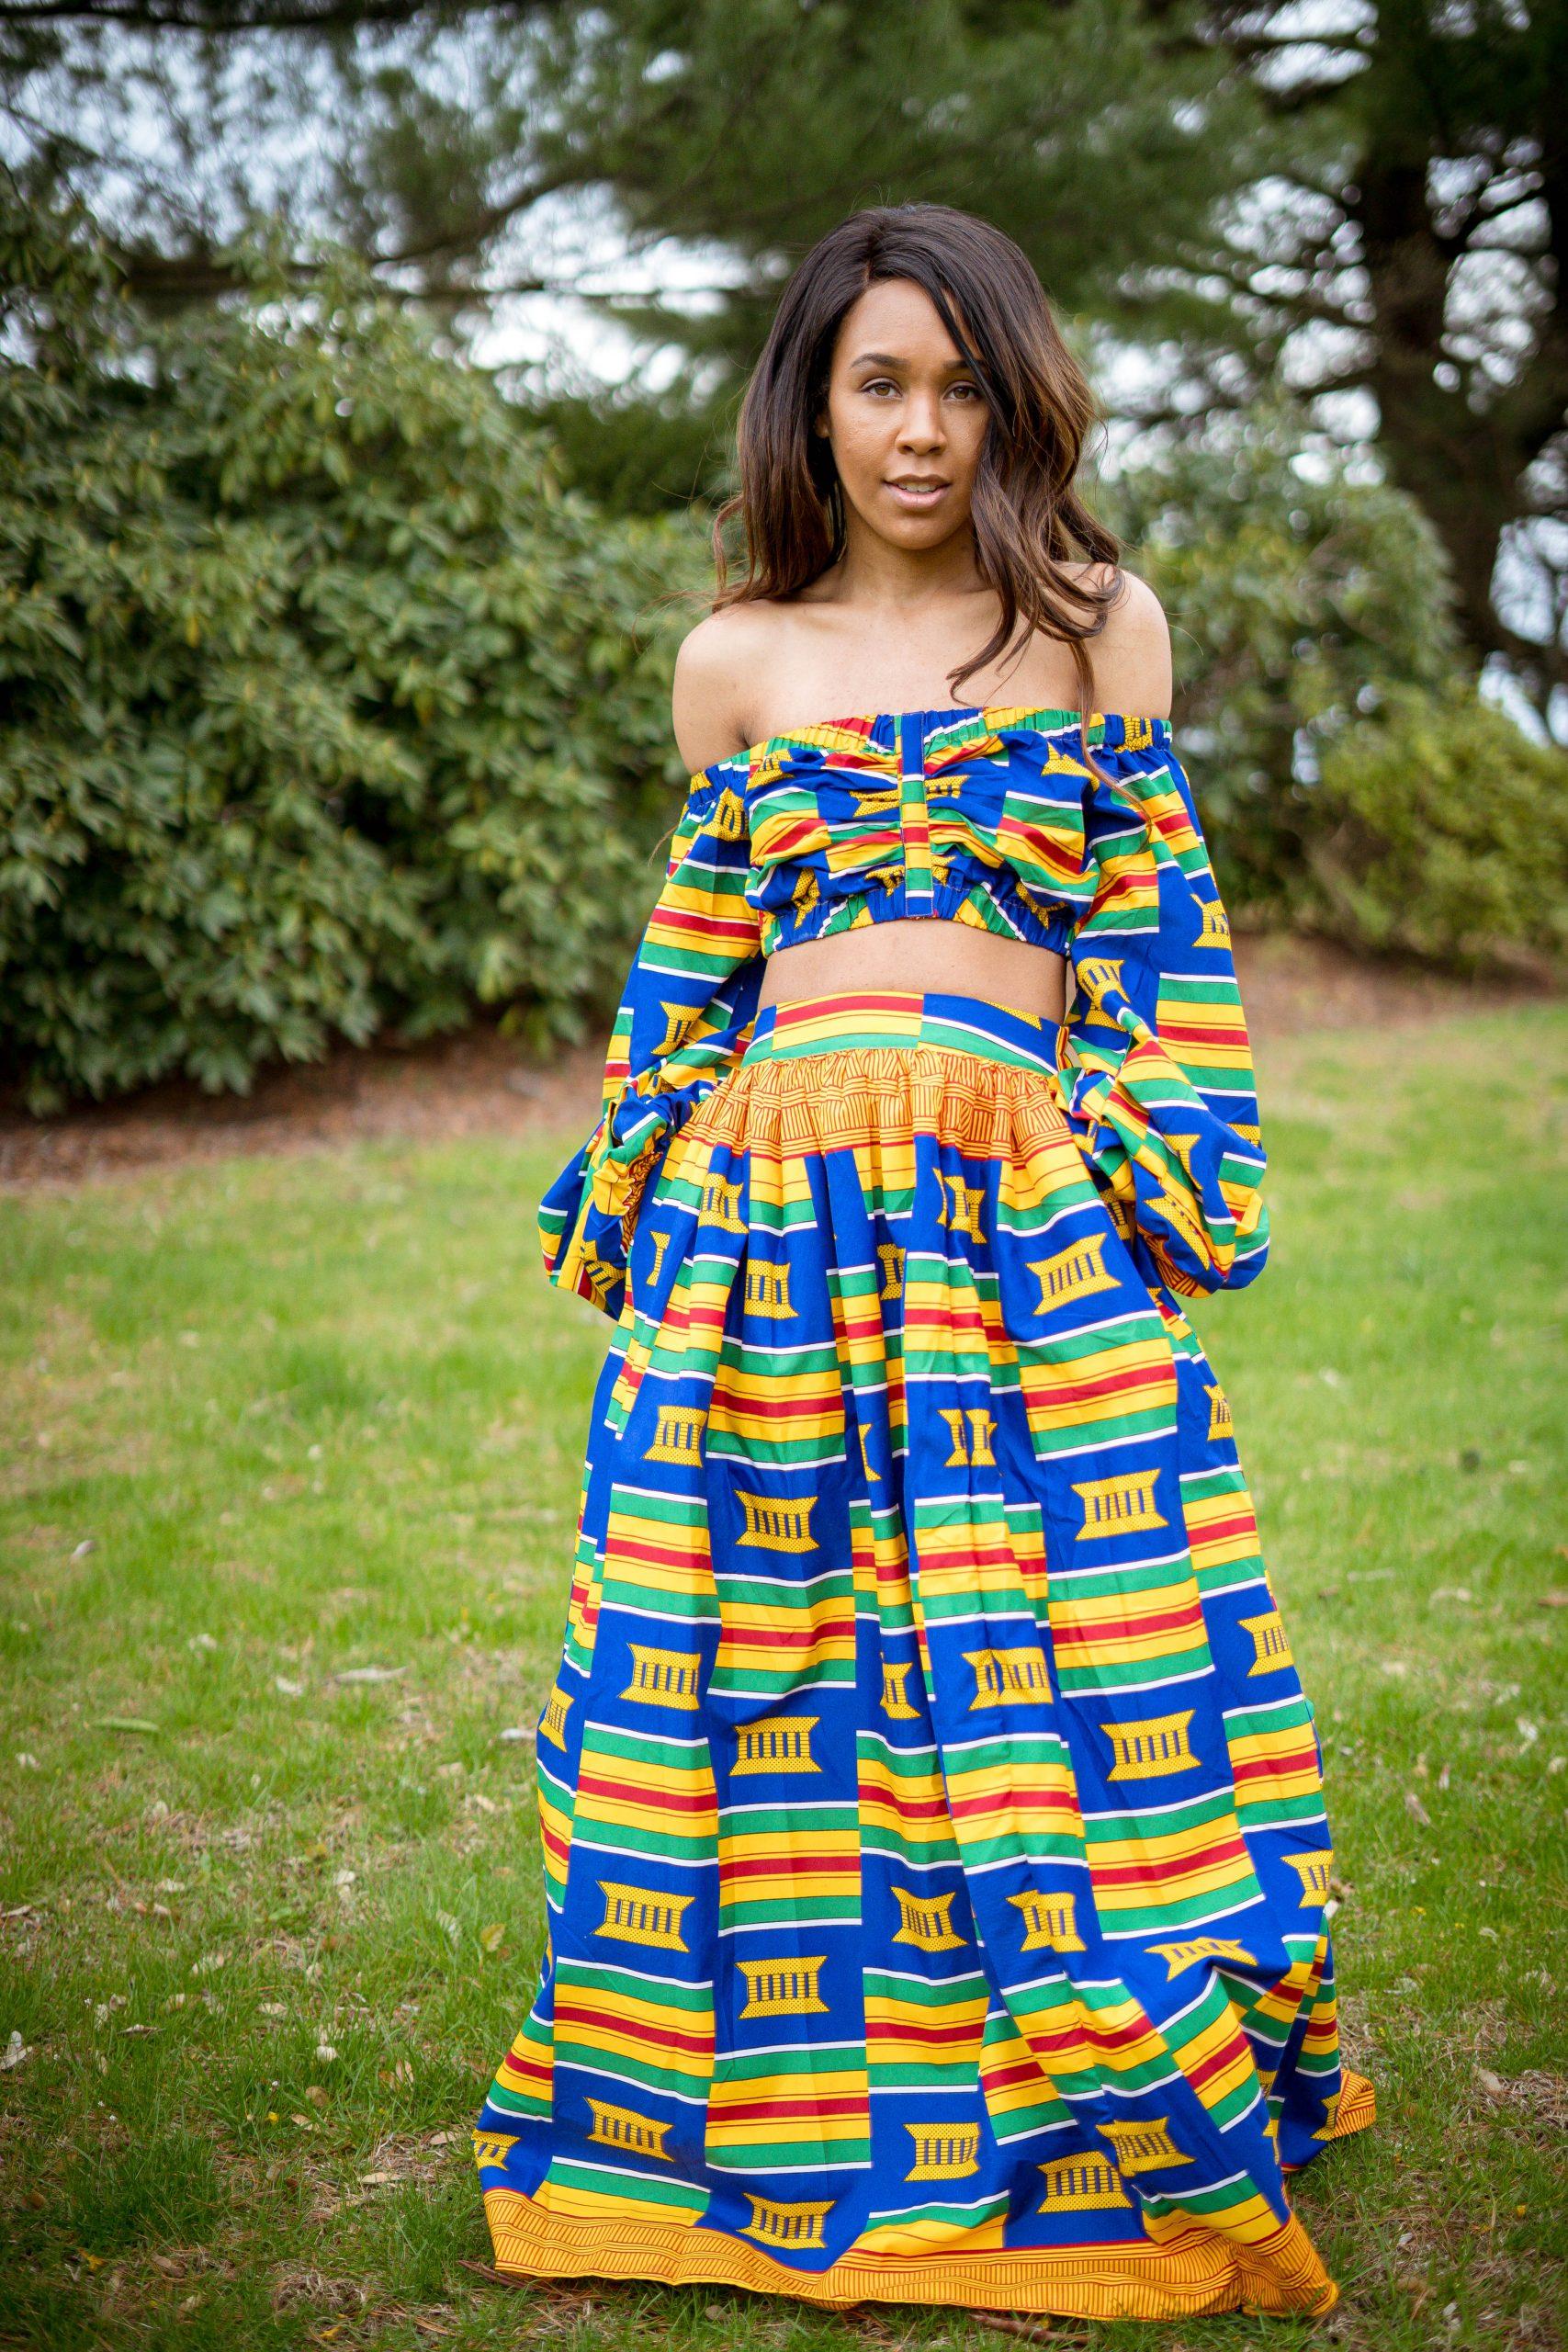 Iesha of LivingLesh on marrying into a Liberian family